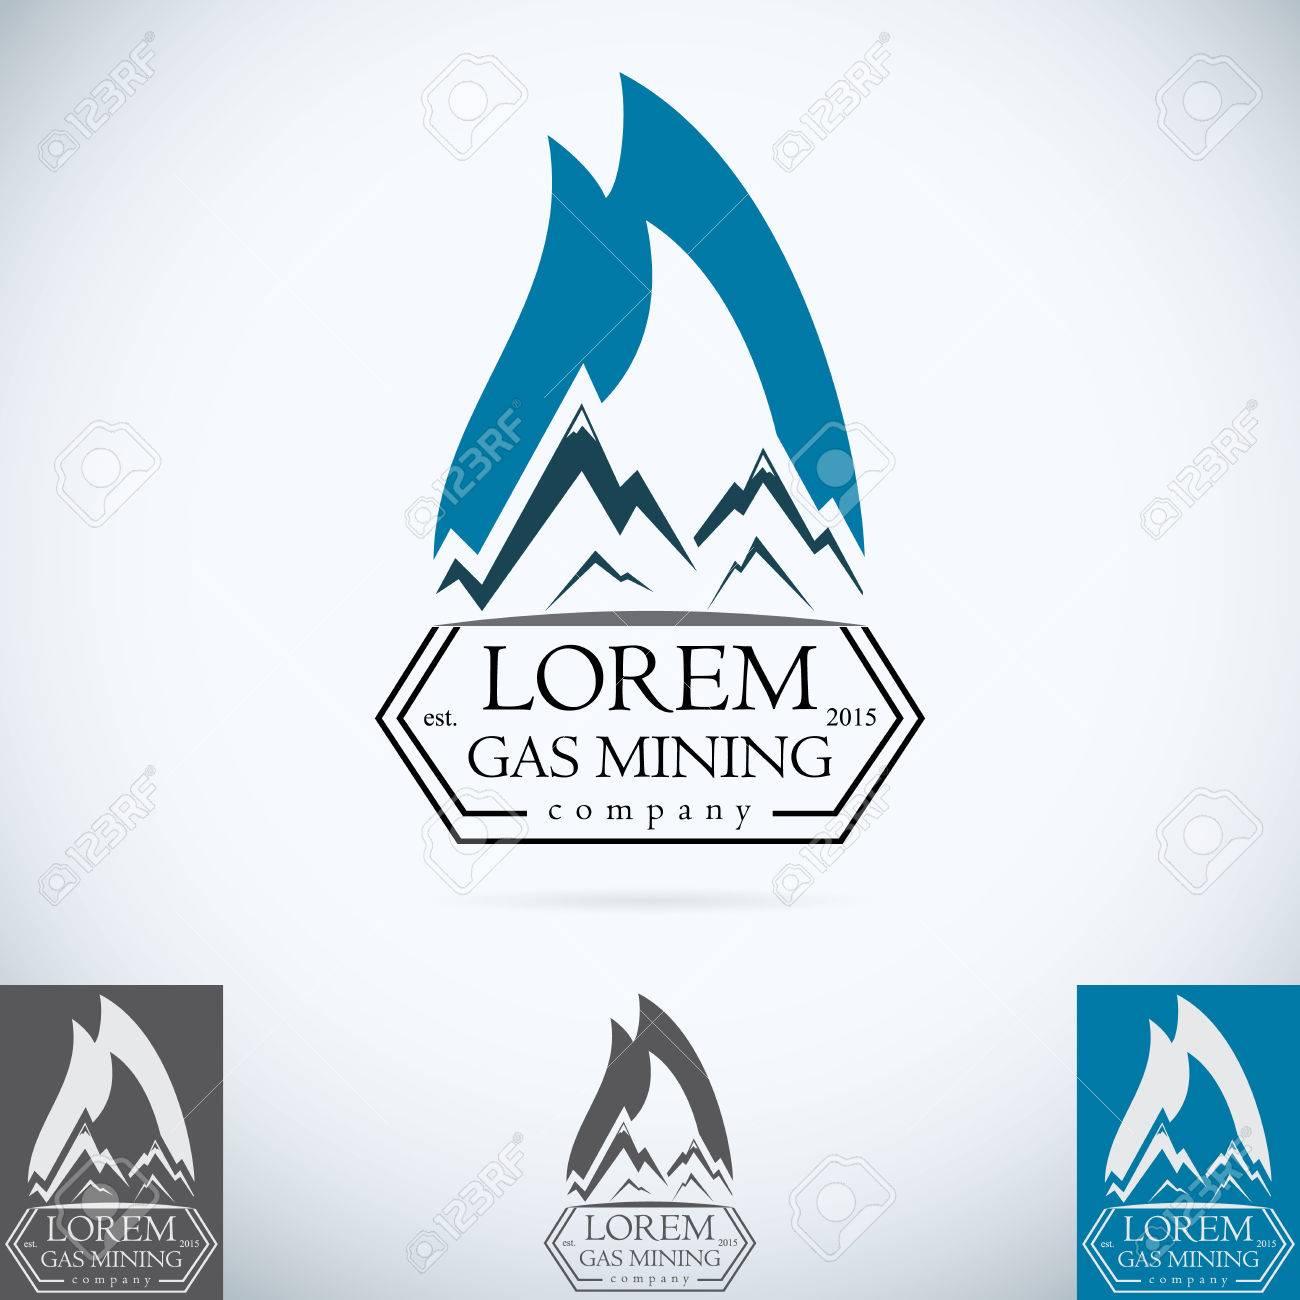 gasoline companies logos